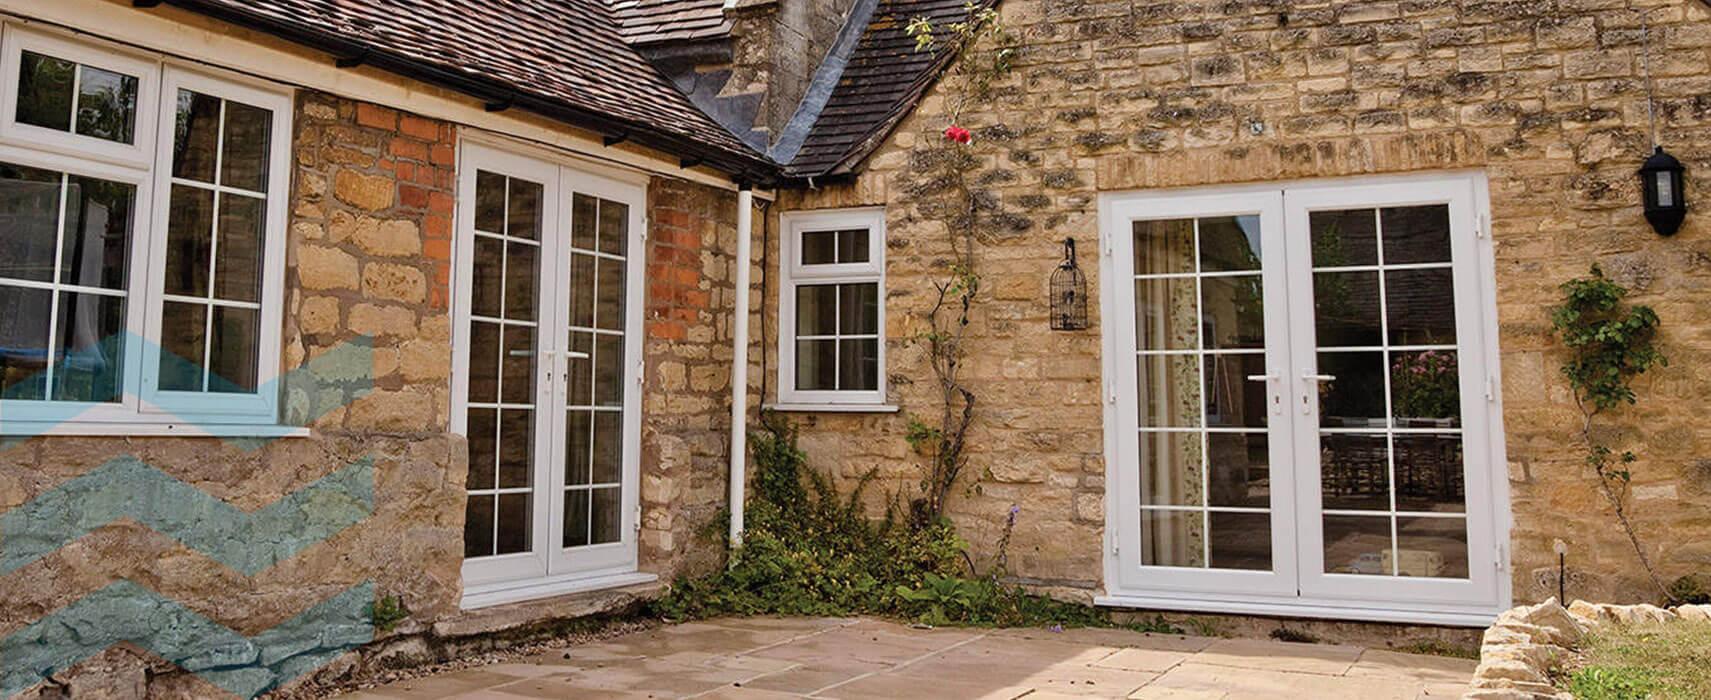 uPVC Cottage Pane Door Desing